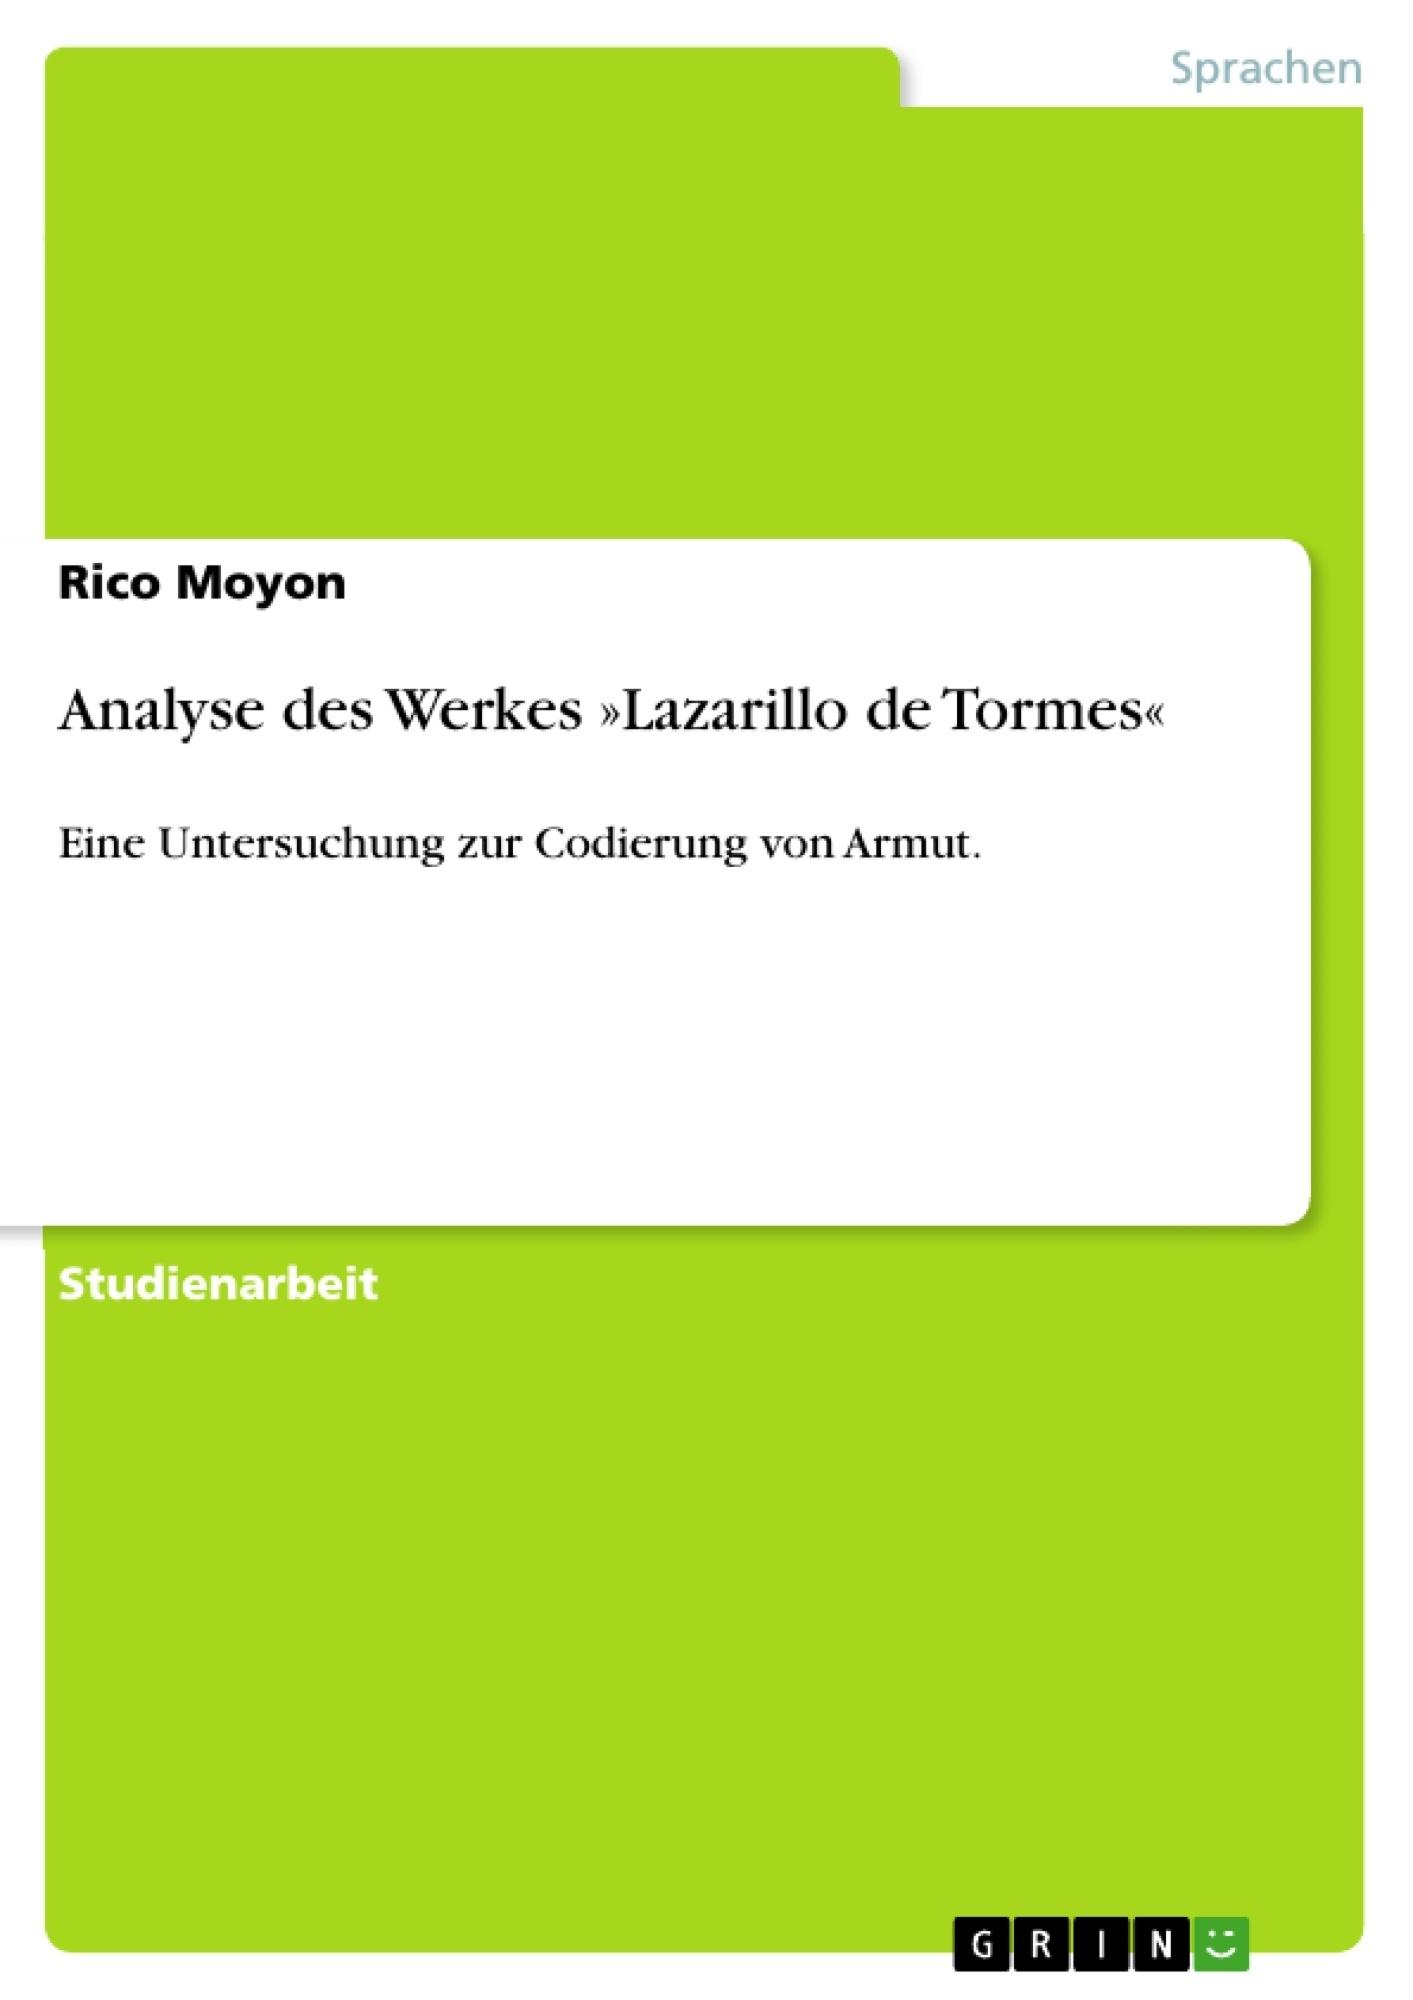 Titel: Analyse des Werkes »Lazarillo de Tormes«